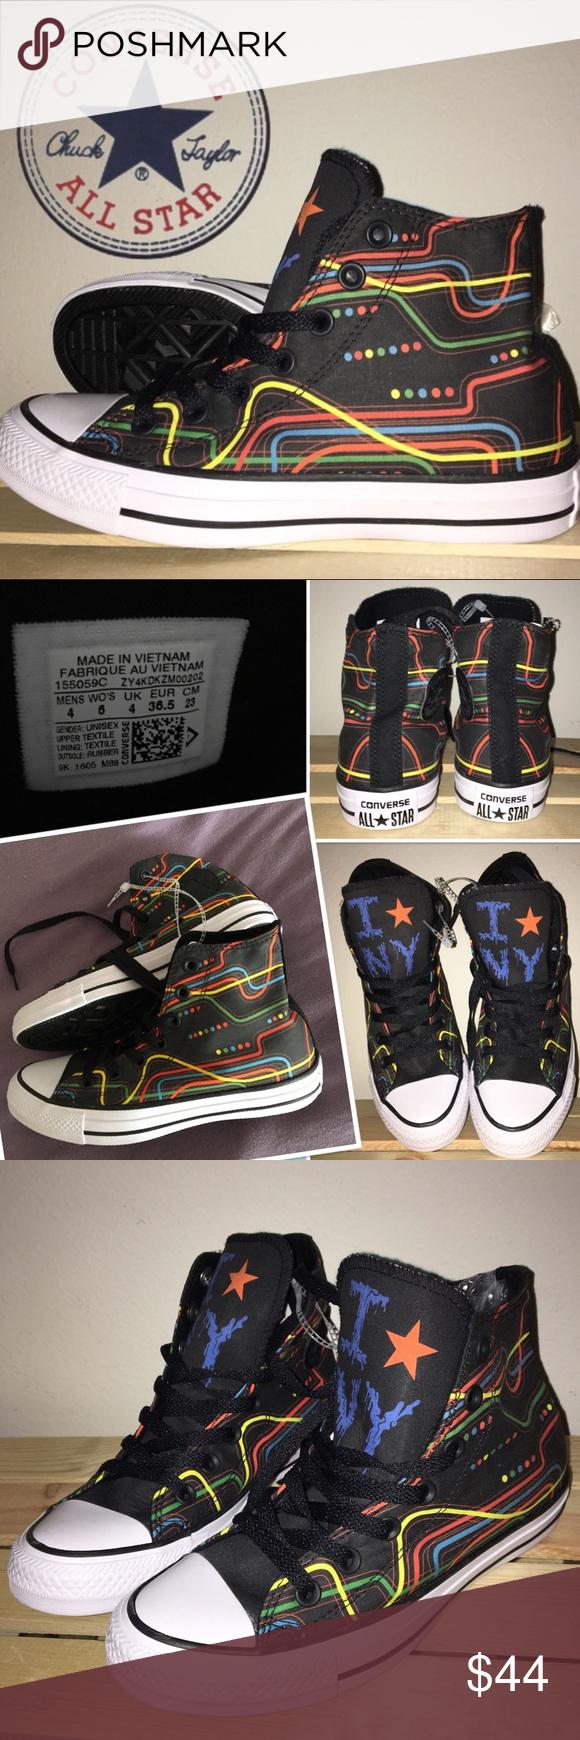 Converse All Star Hi Tops NY Subway Map Sneakers Brand new